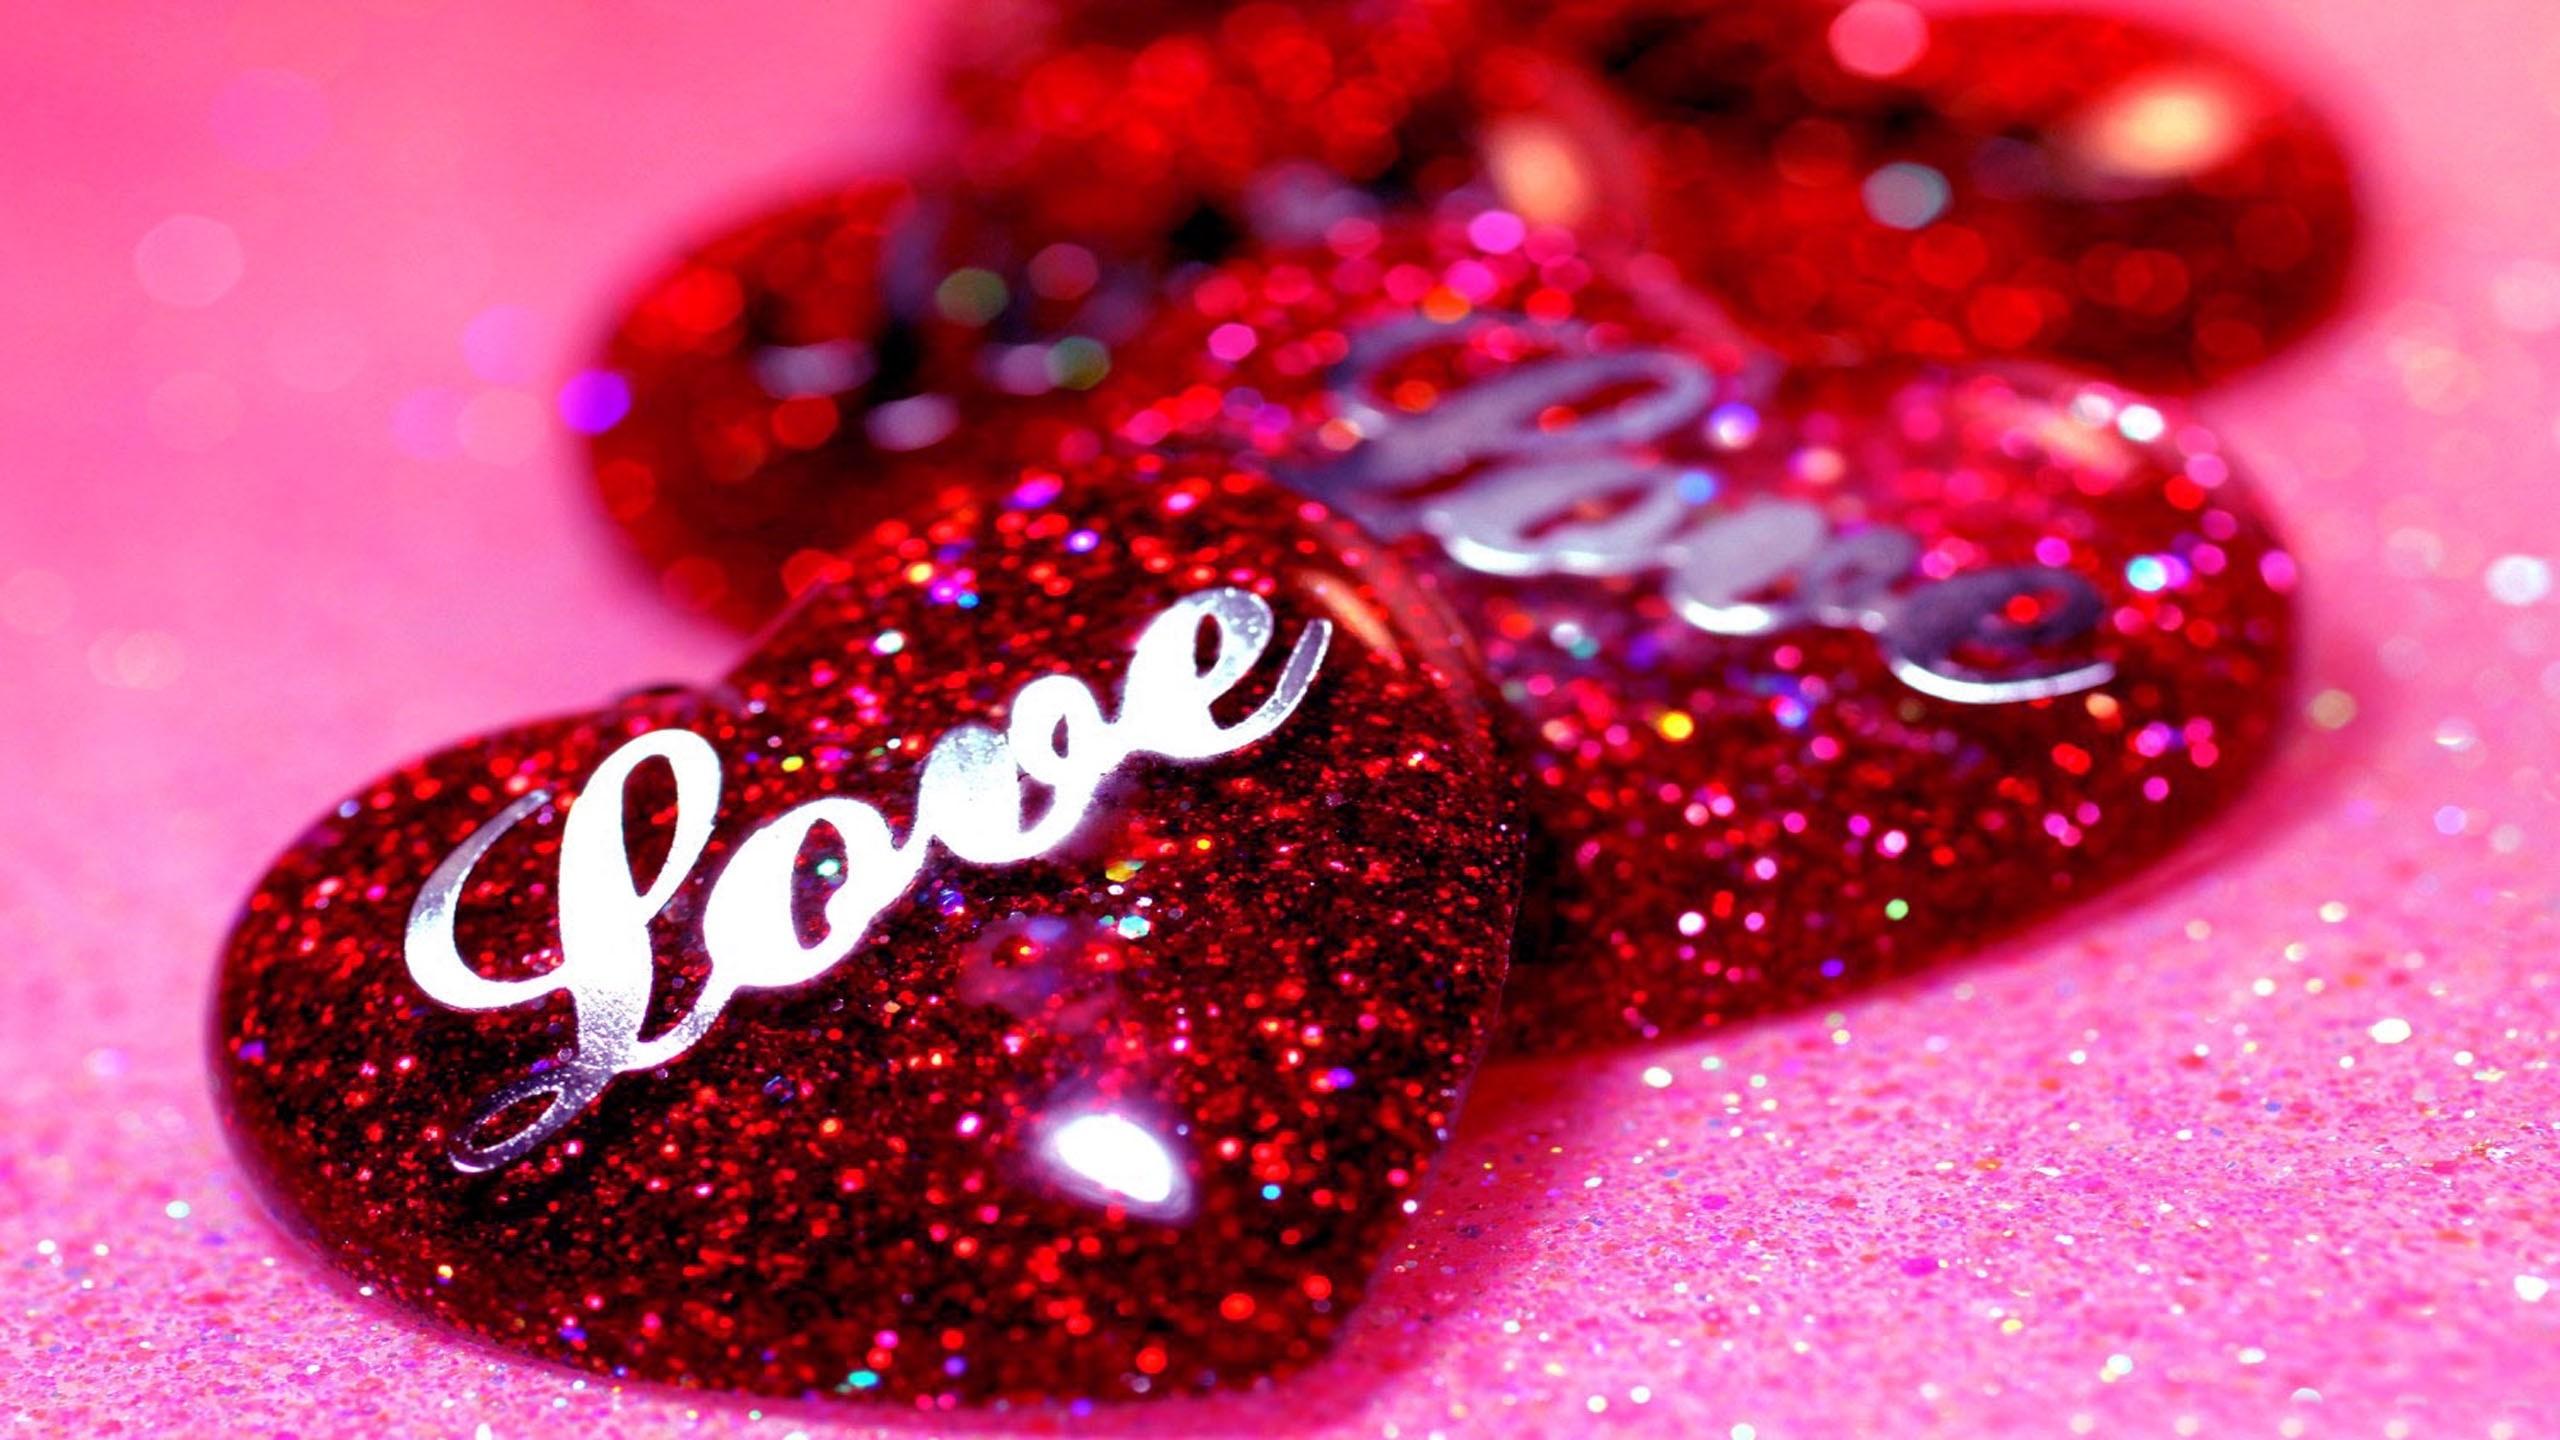 Beautiful Love Hearts Desktop Background. Download …